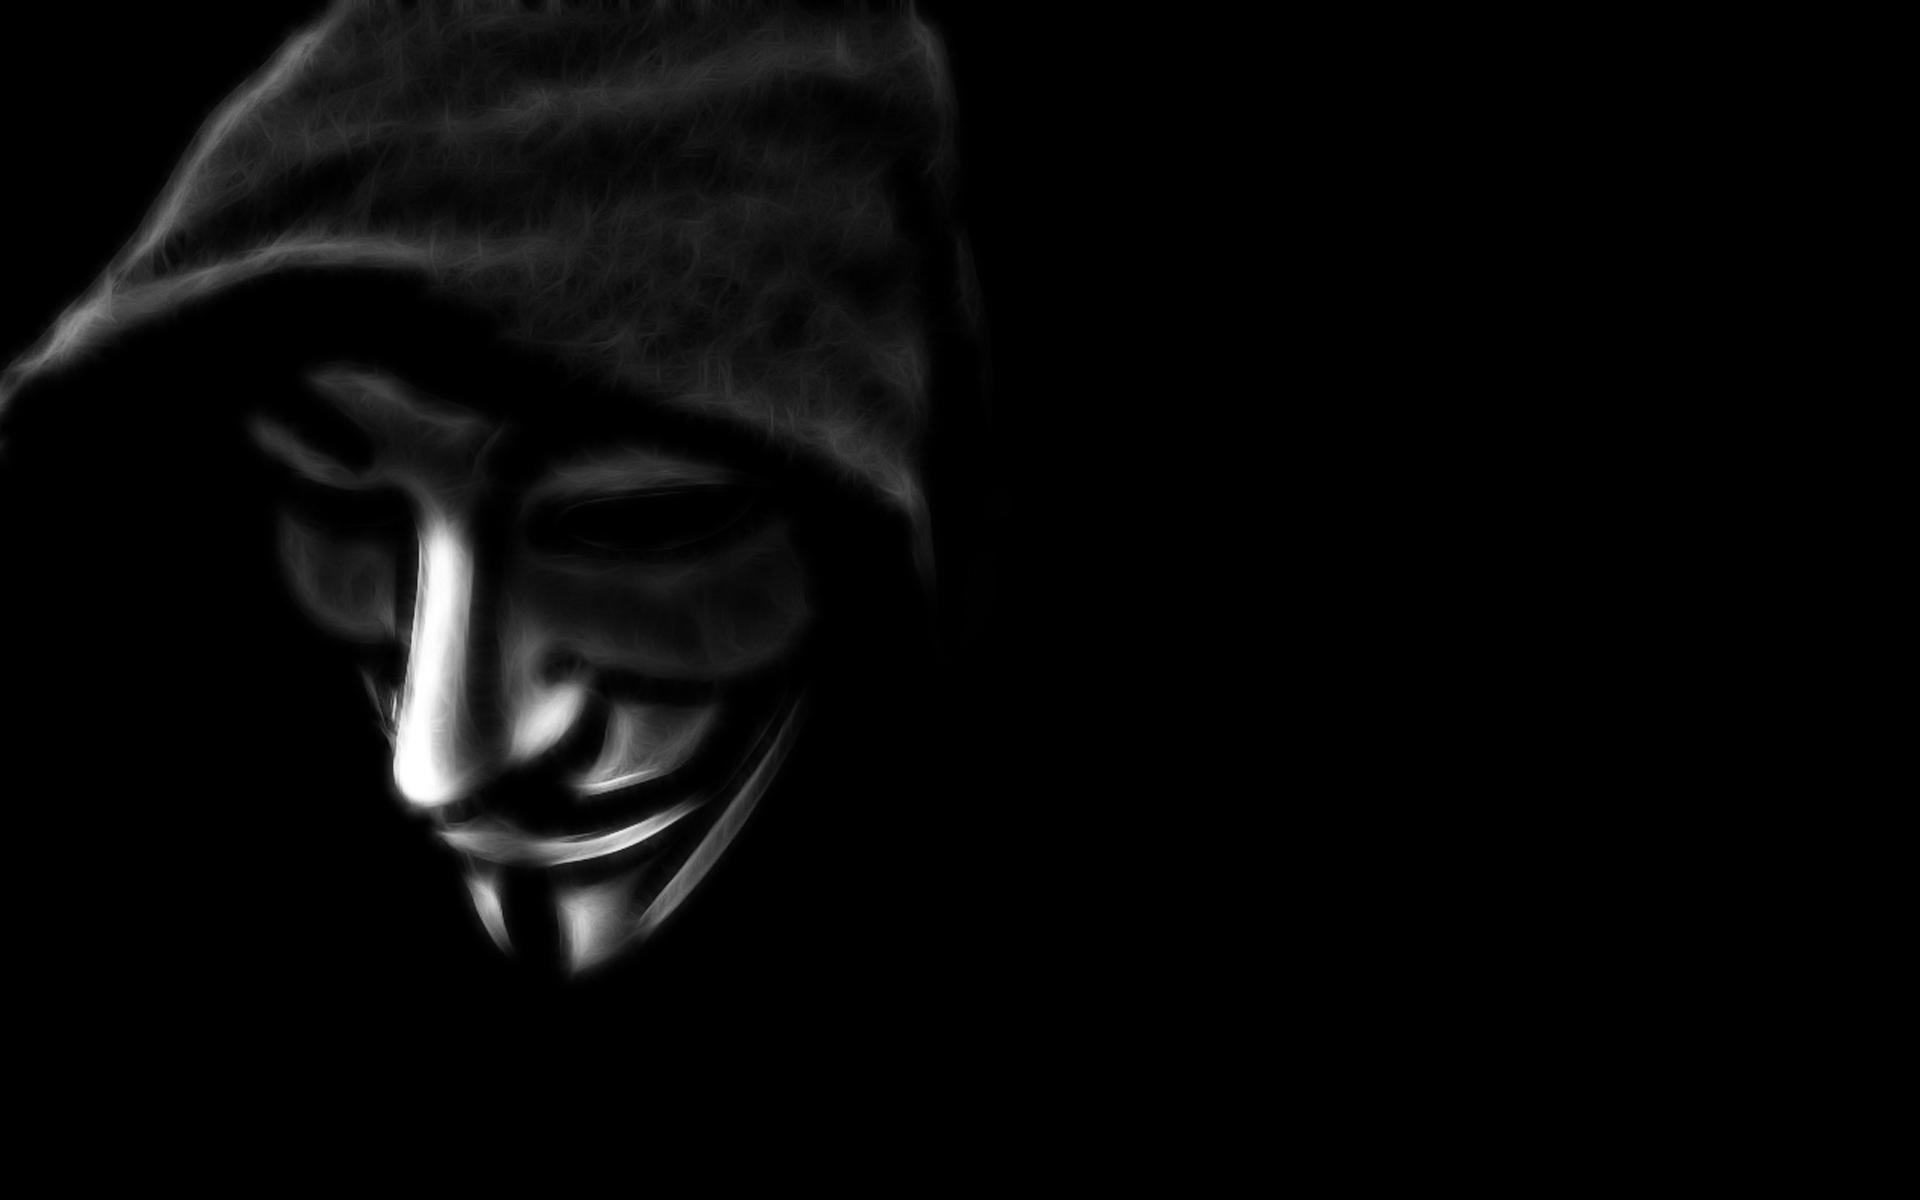 Hd Wallpapers Anonymous Wallpaper Hd Download Wallcapture Com 8 Bit Gambar Hitam